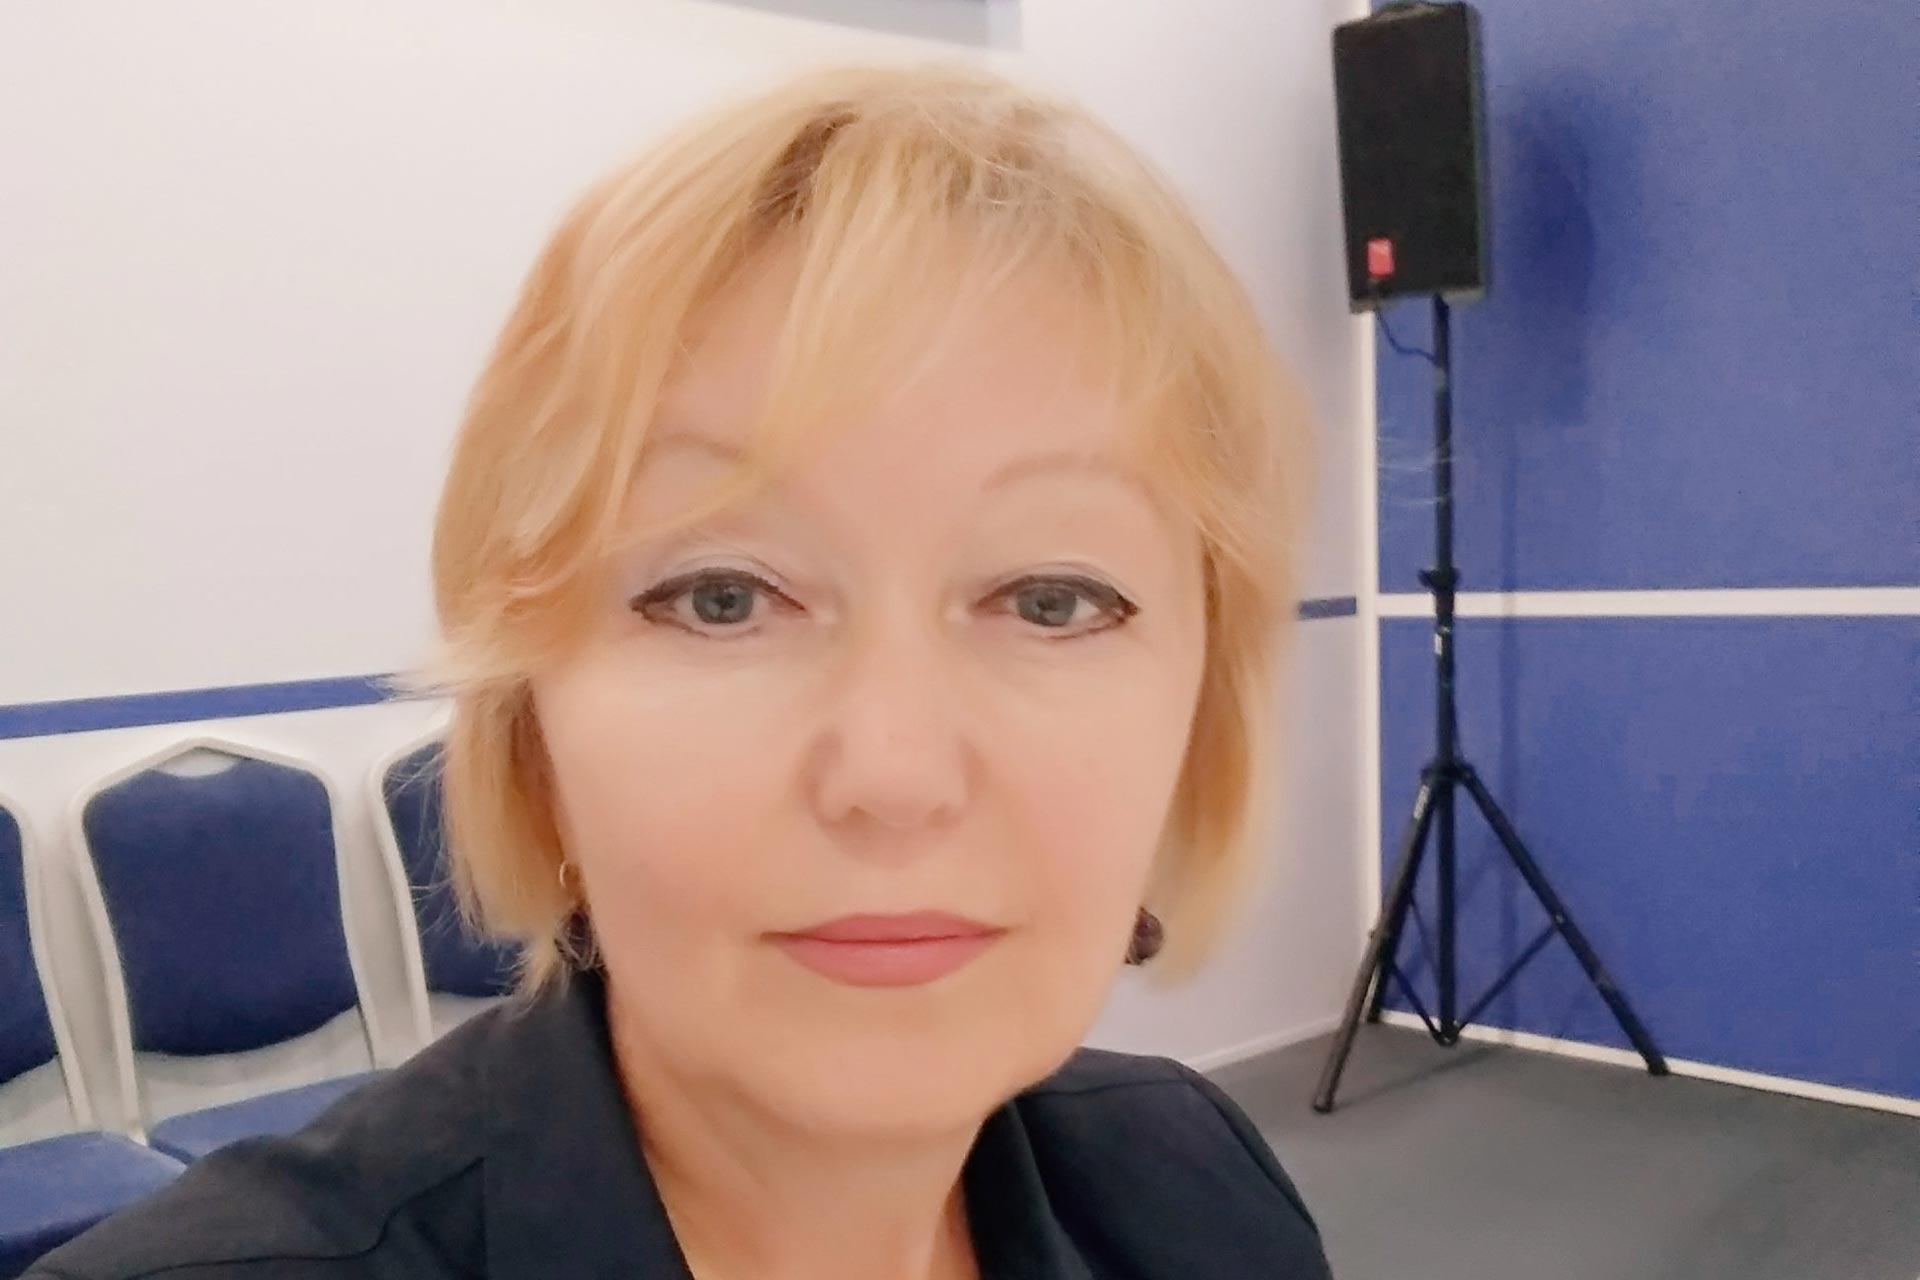 Ирина Шуваева. Предприниматель, бизнес-консультант, франч-брокер, действующий франчайзи